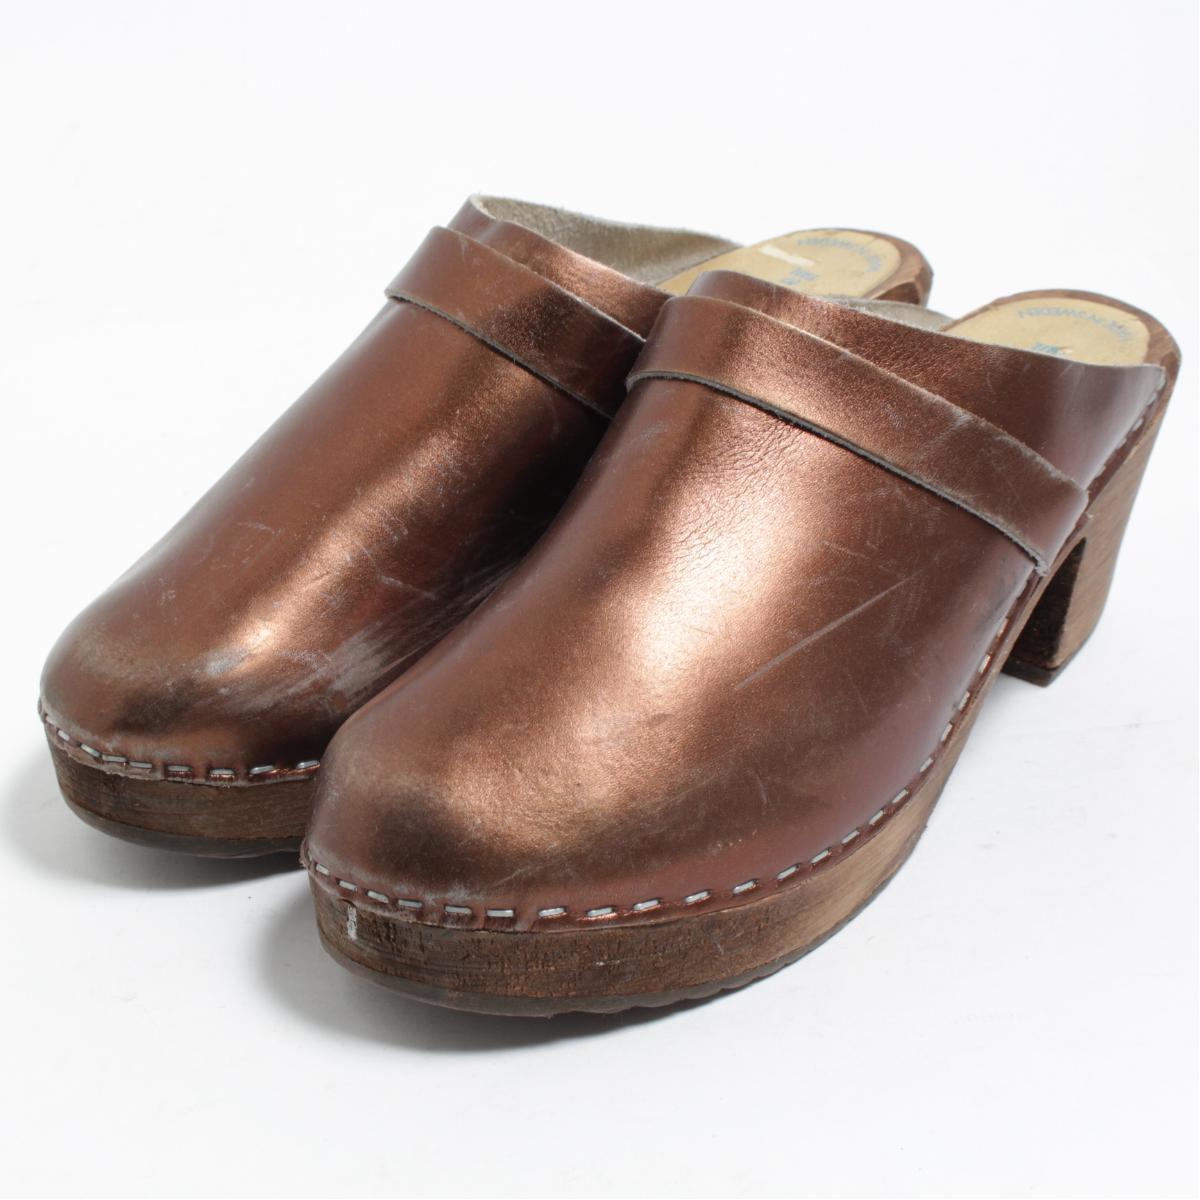 2f264d7faa9e3 39 Lady's 24.5cm /bom8157 made in TESSA CLOGS high-heeled shoes sabot  sandals Sweden